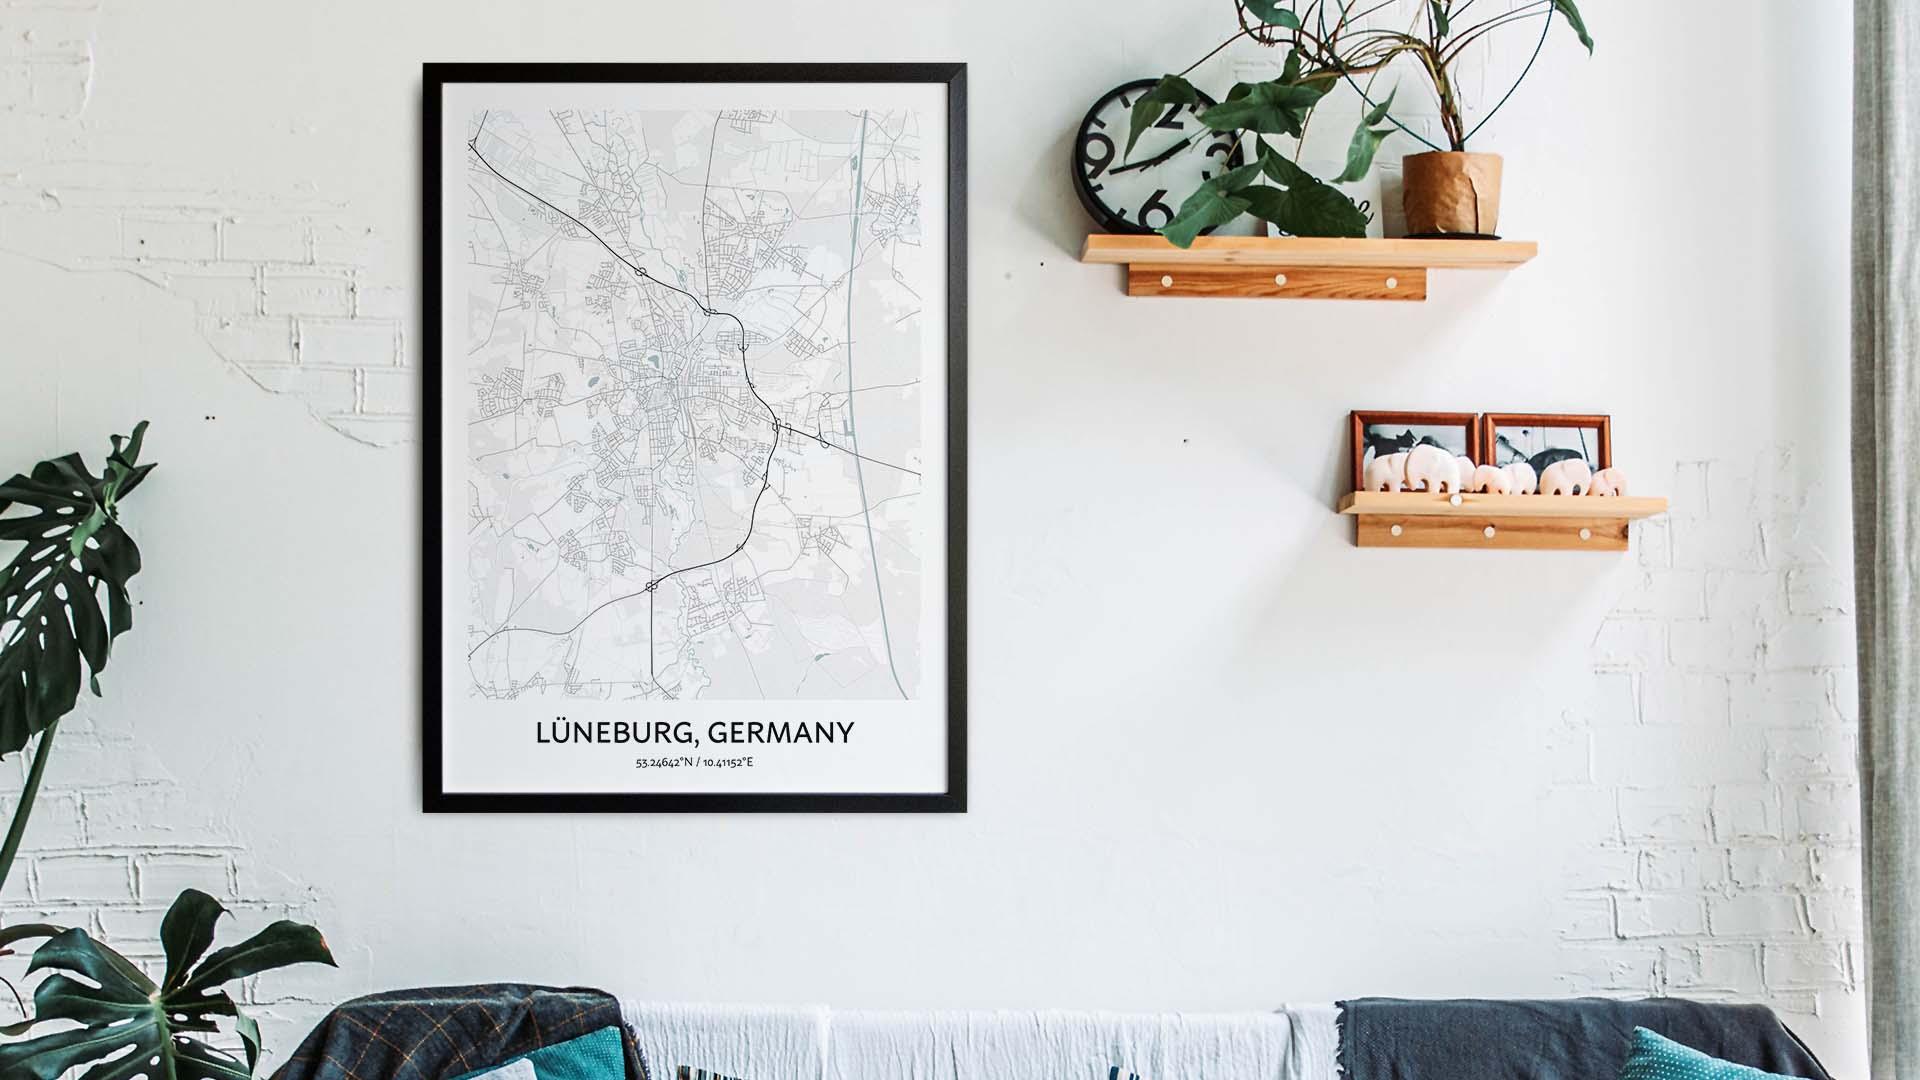 Luneburg map art